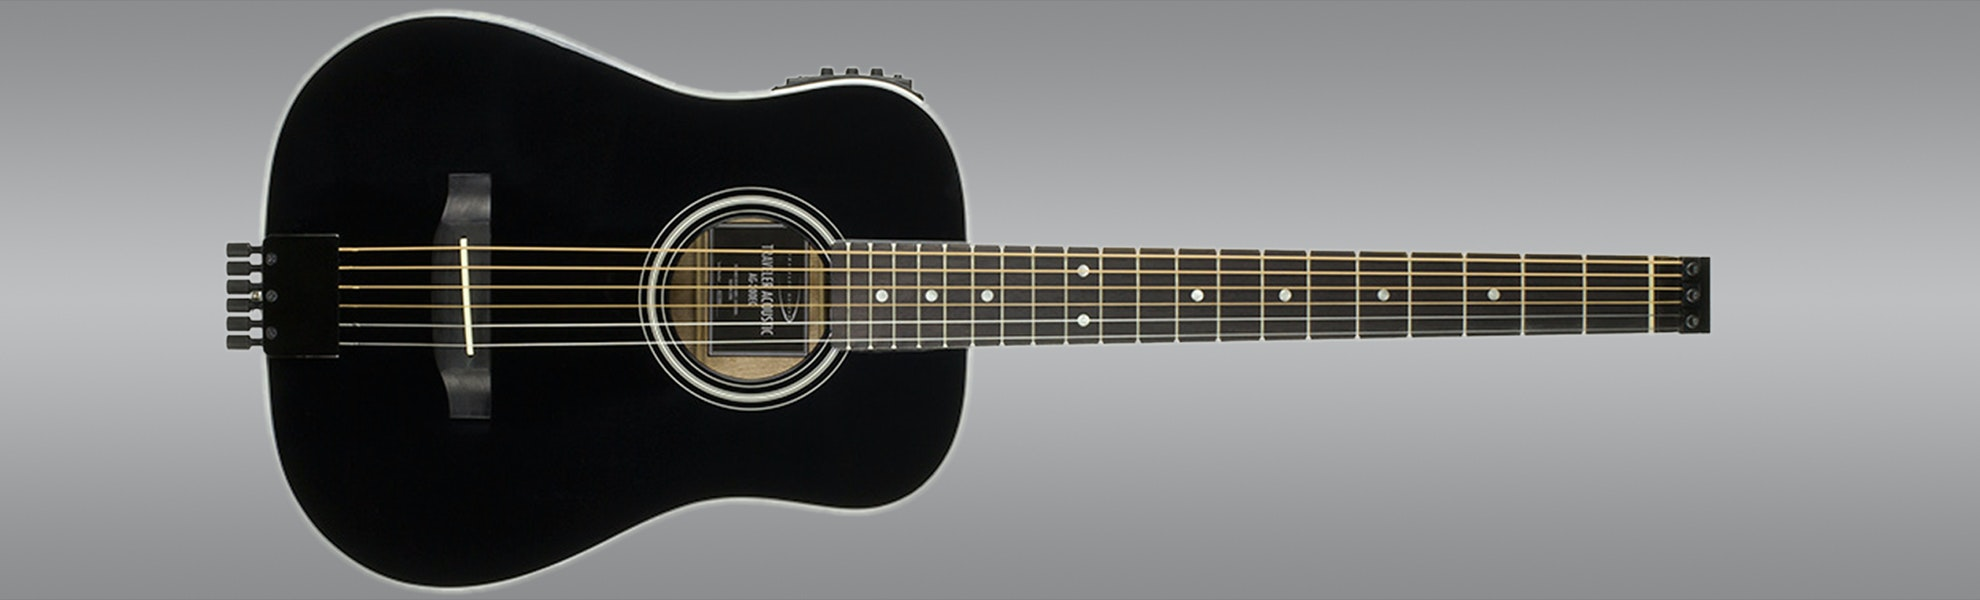 Traveler Guitar B-Stock AG-200EQ Guitar